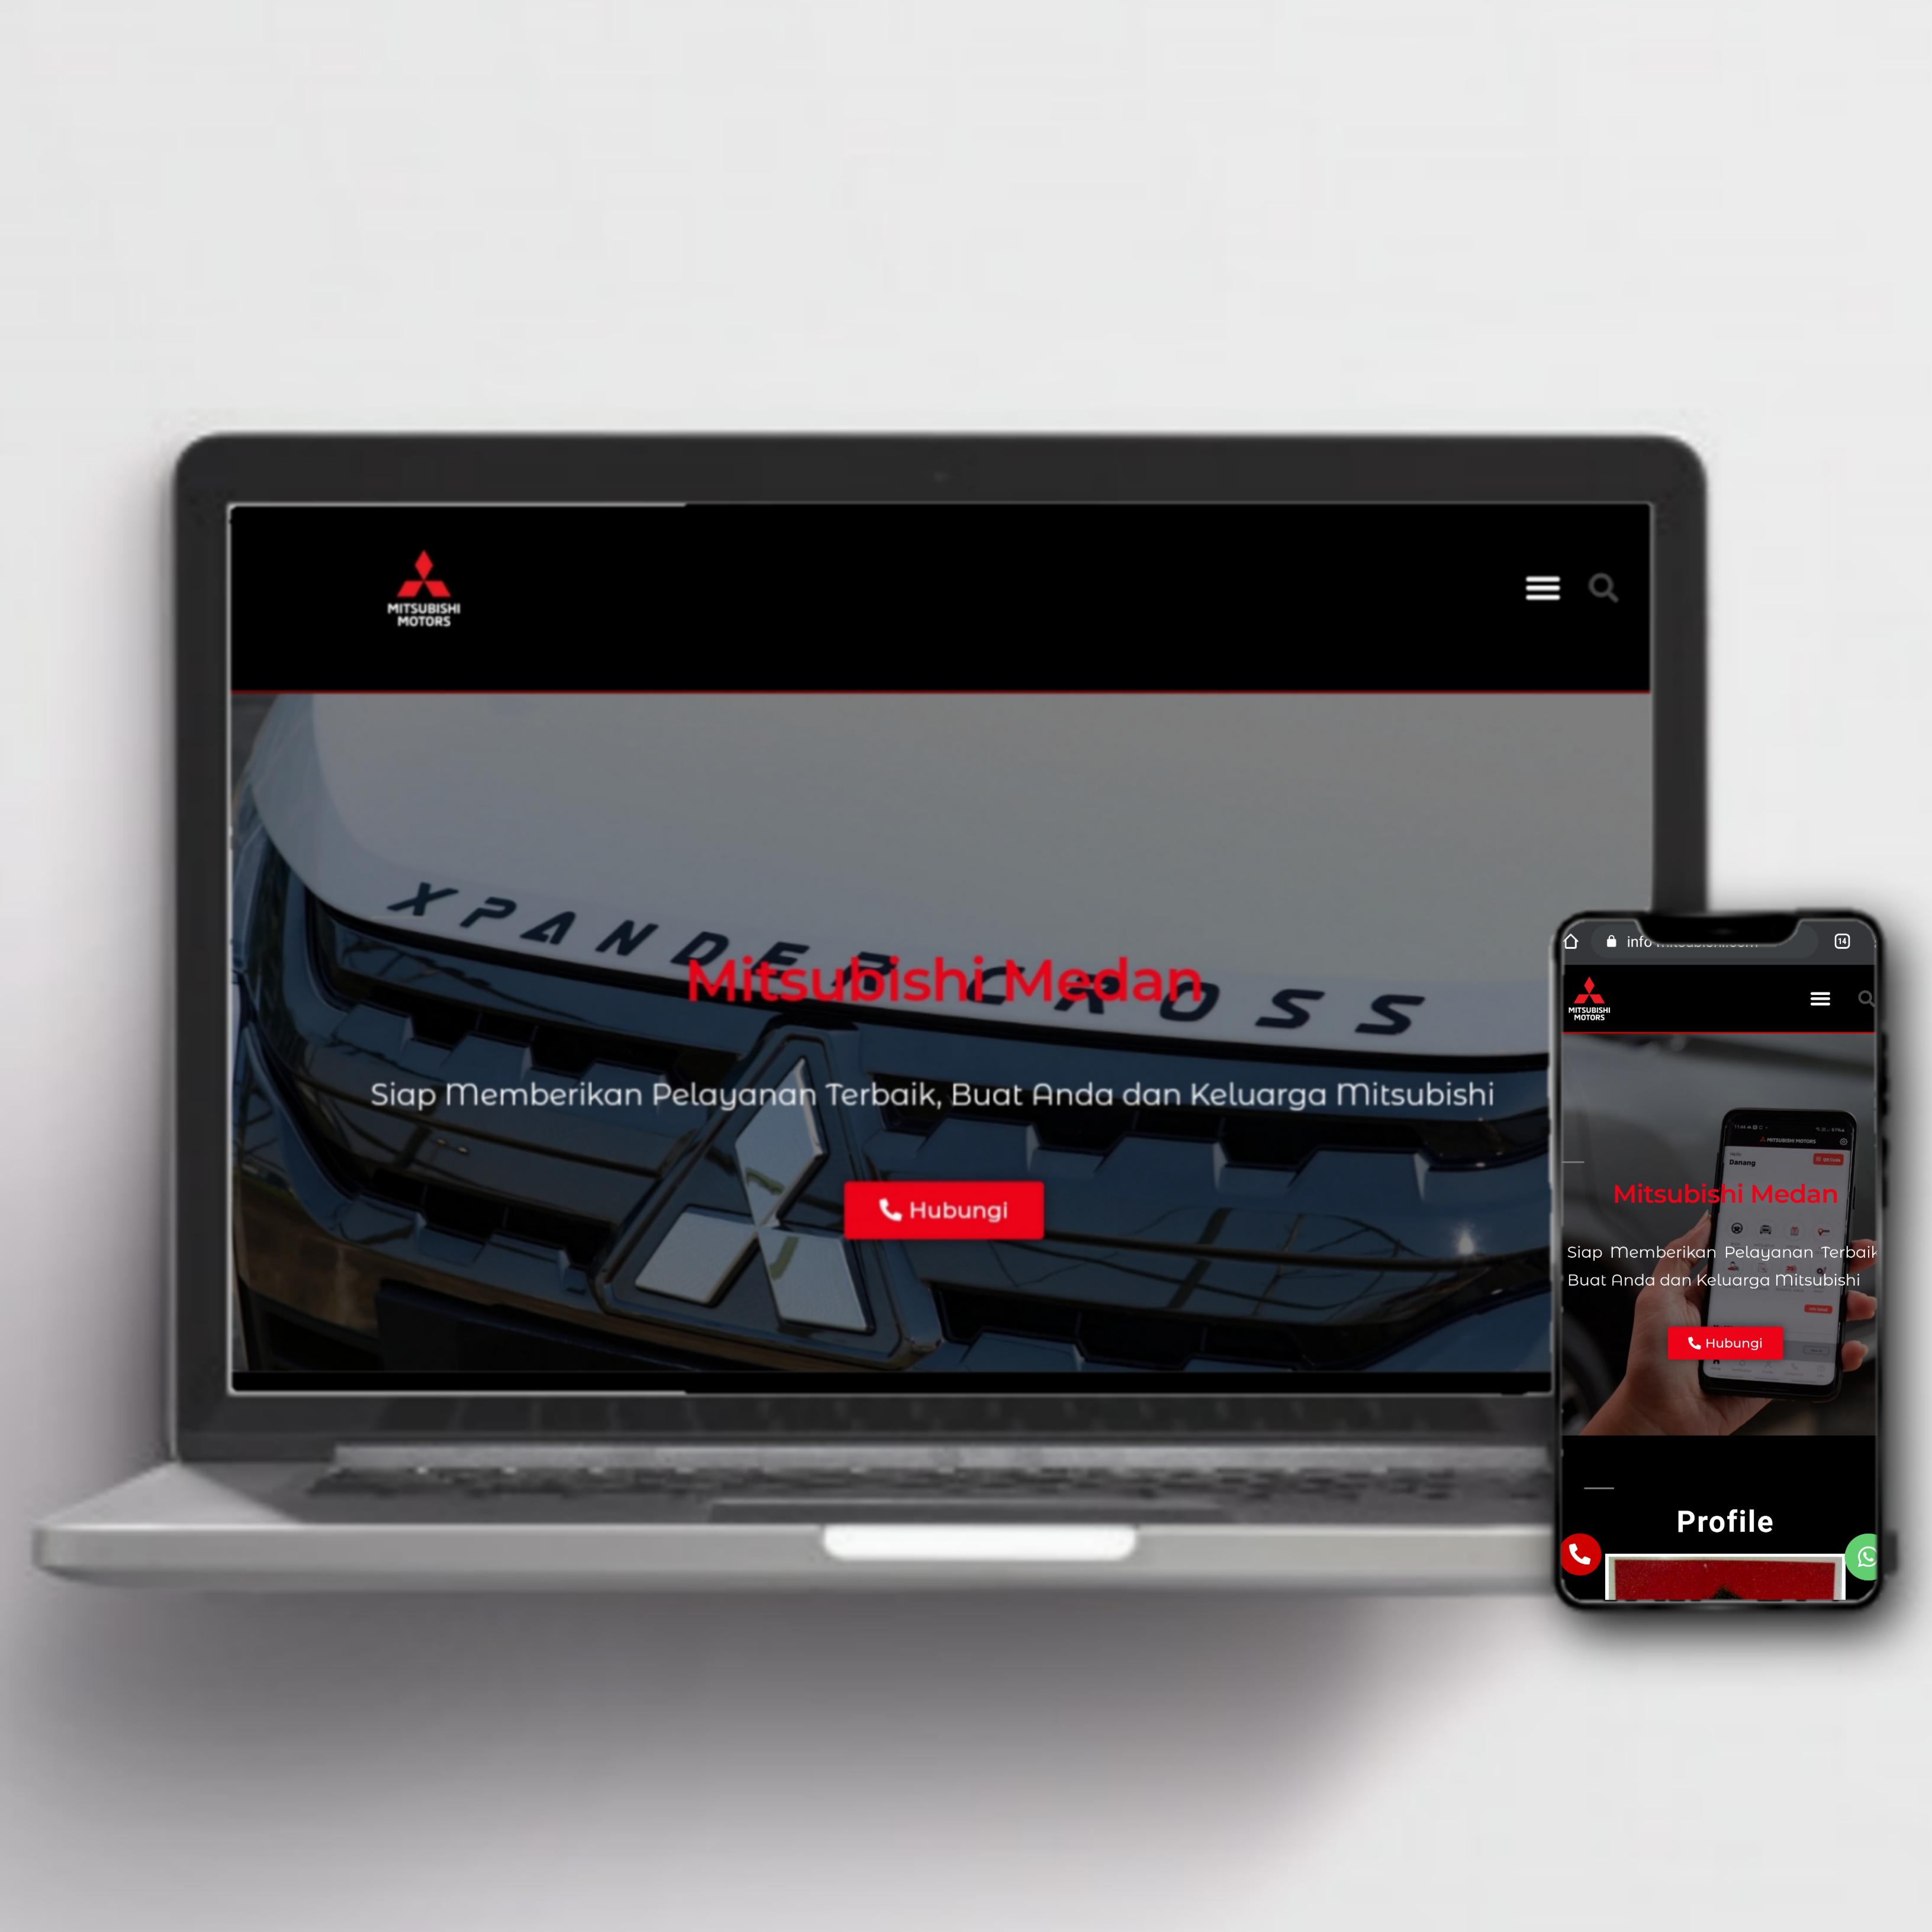 Project Jalanwebsite